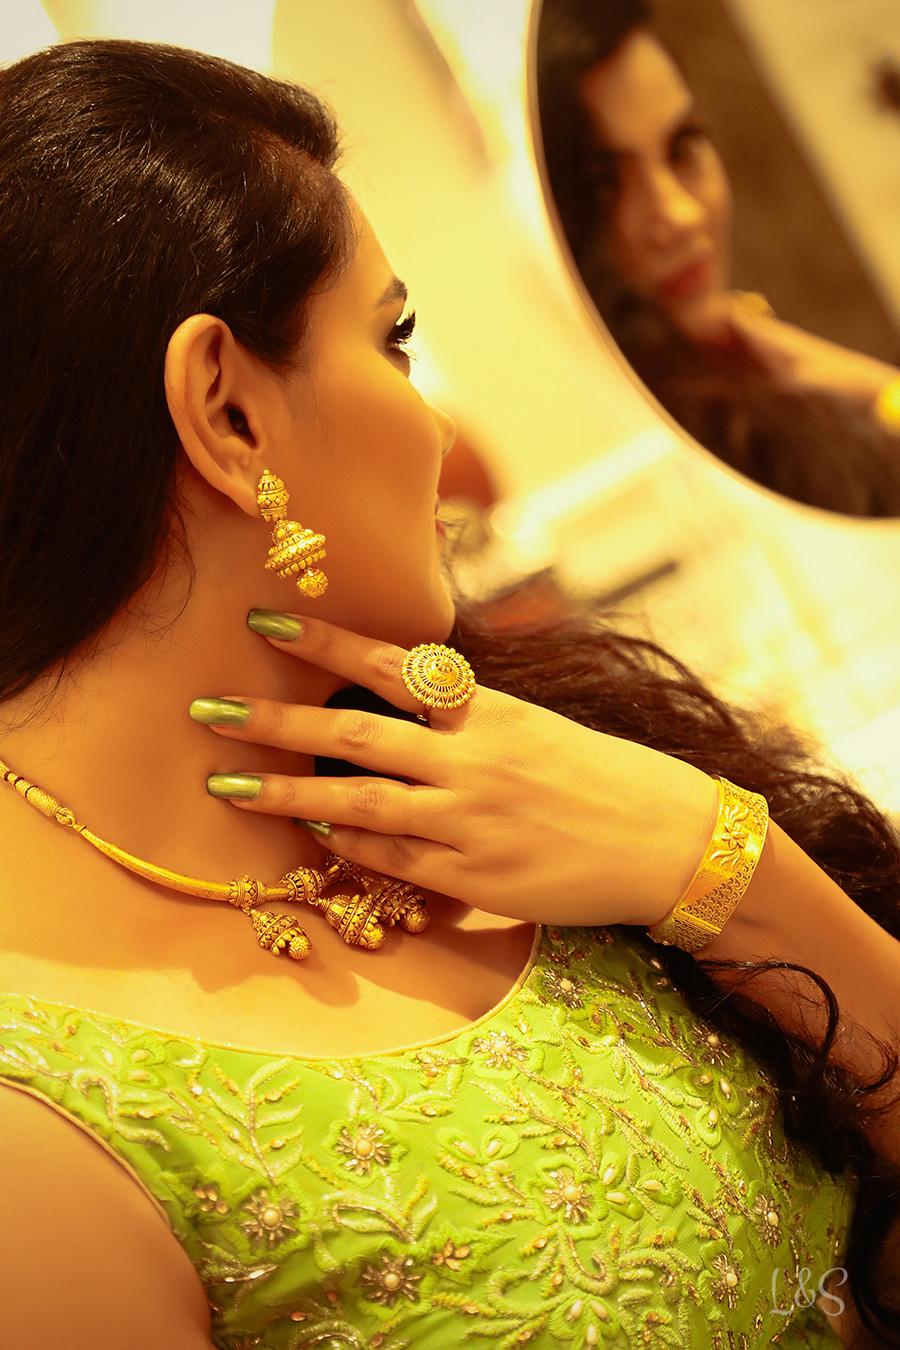 BJ PHOTOGRAPHY EDITOR | Studio Lush Look - Jwelery - Green 18-Oc